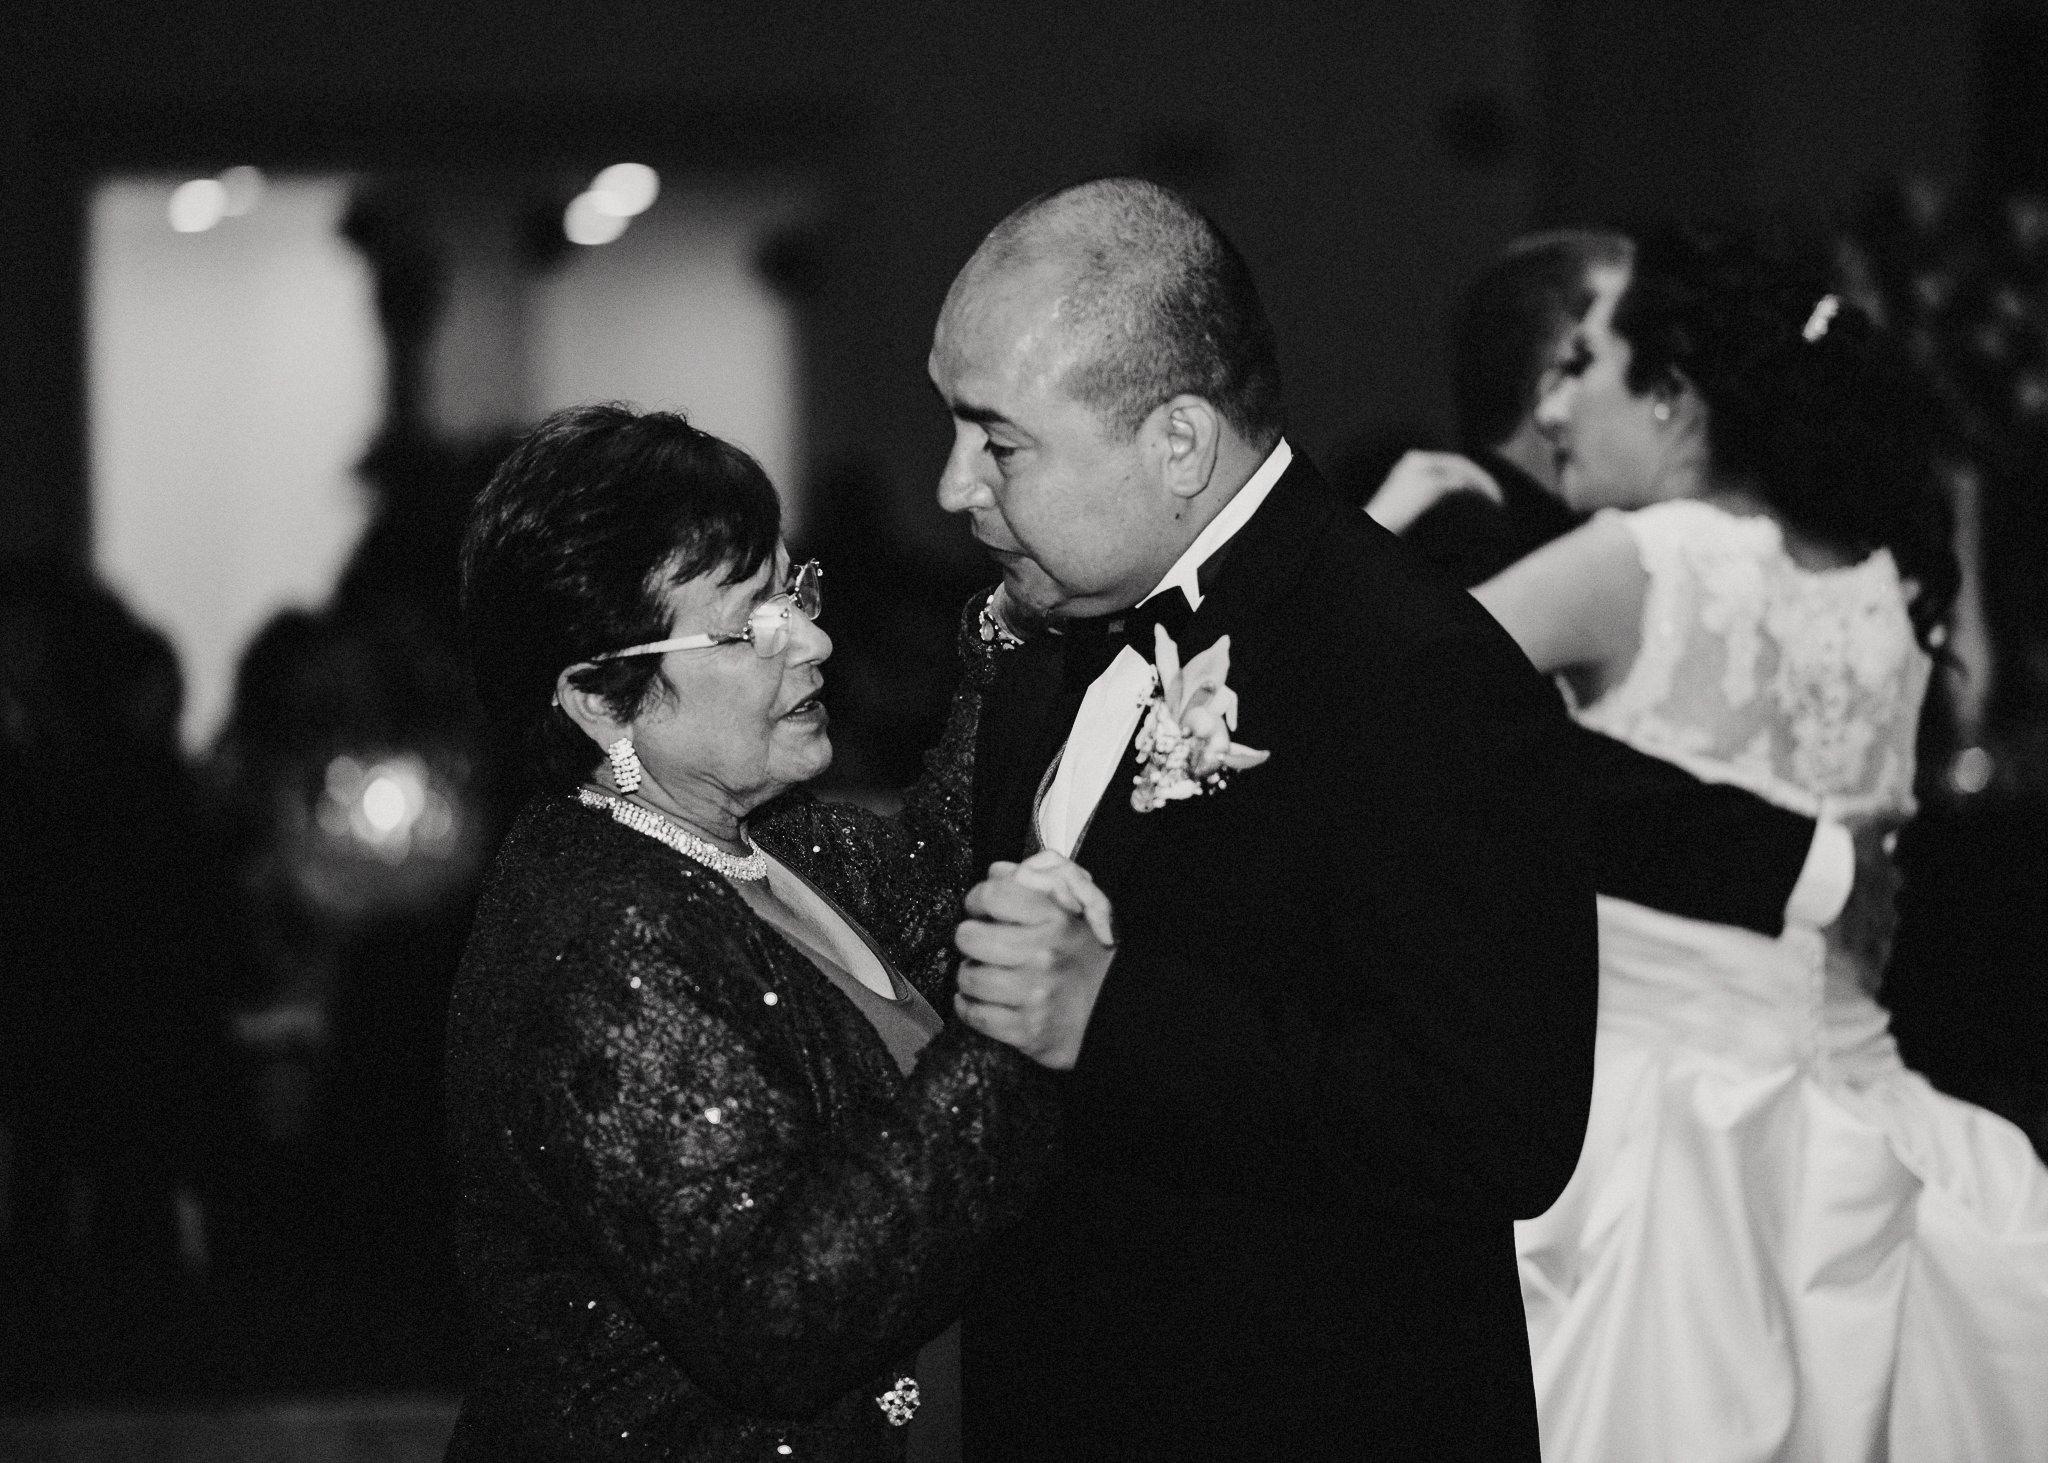 Wedding-Boda-Tulancingo-Hidalgo-Salon-Essenzia-Luis-Houdin-51-film